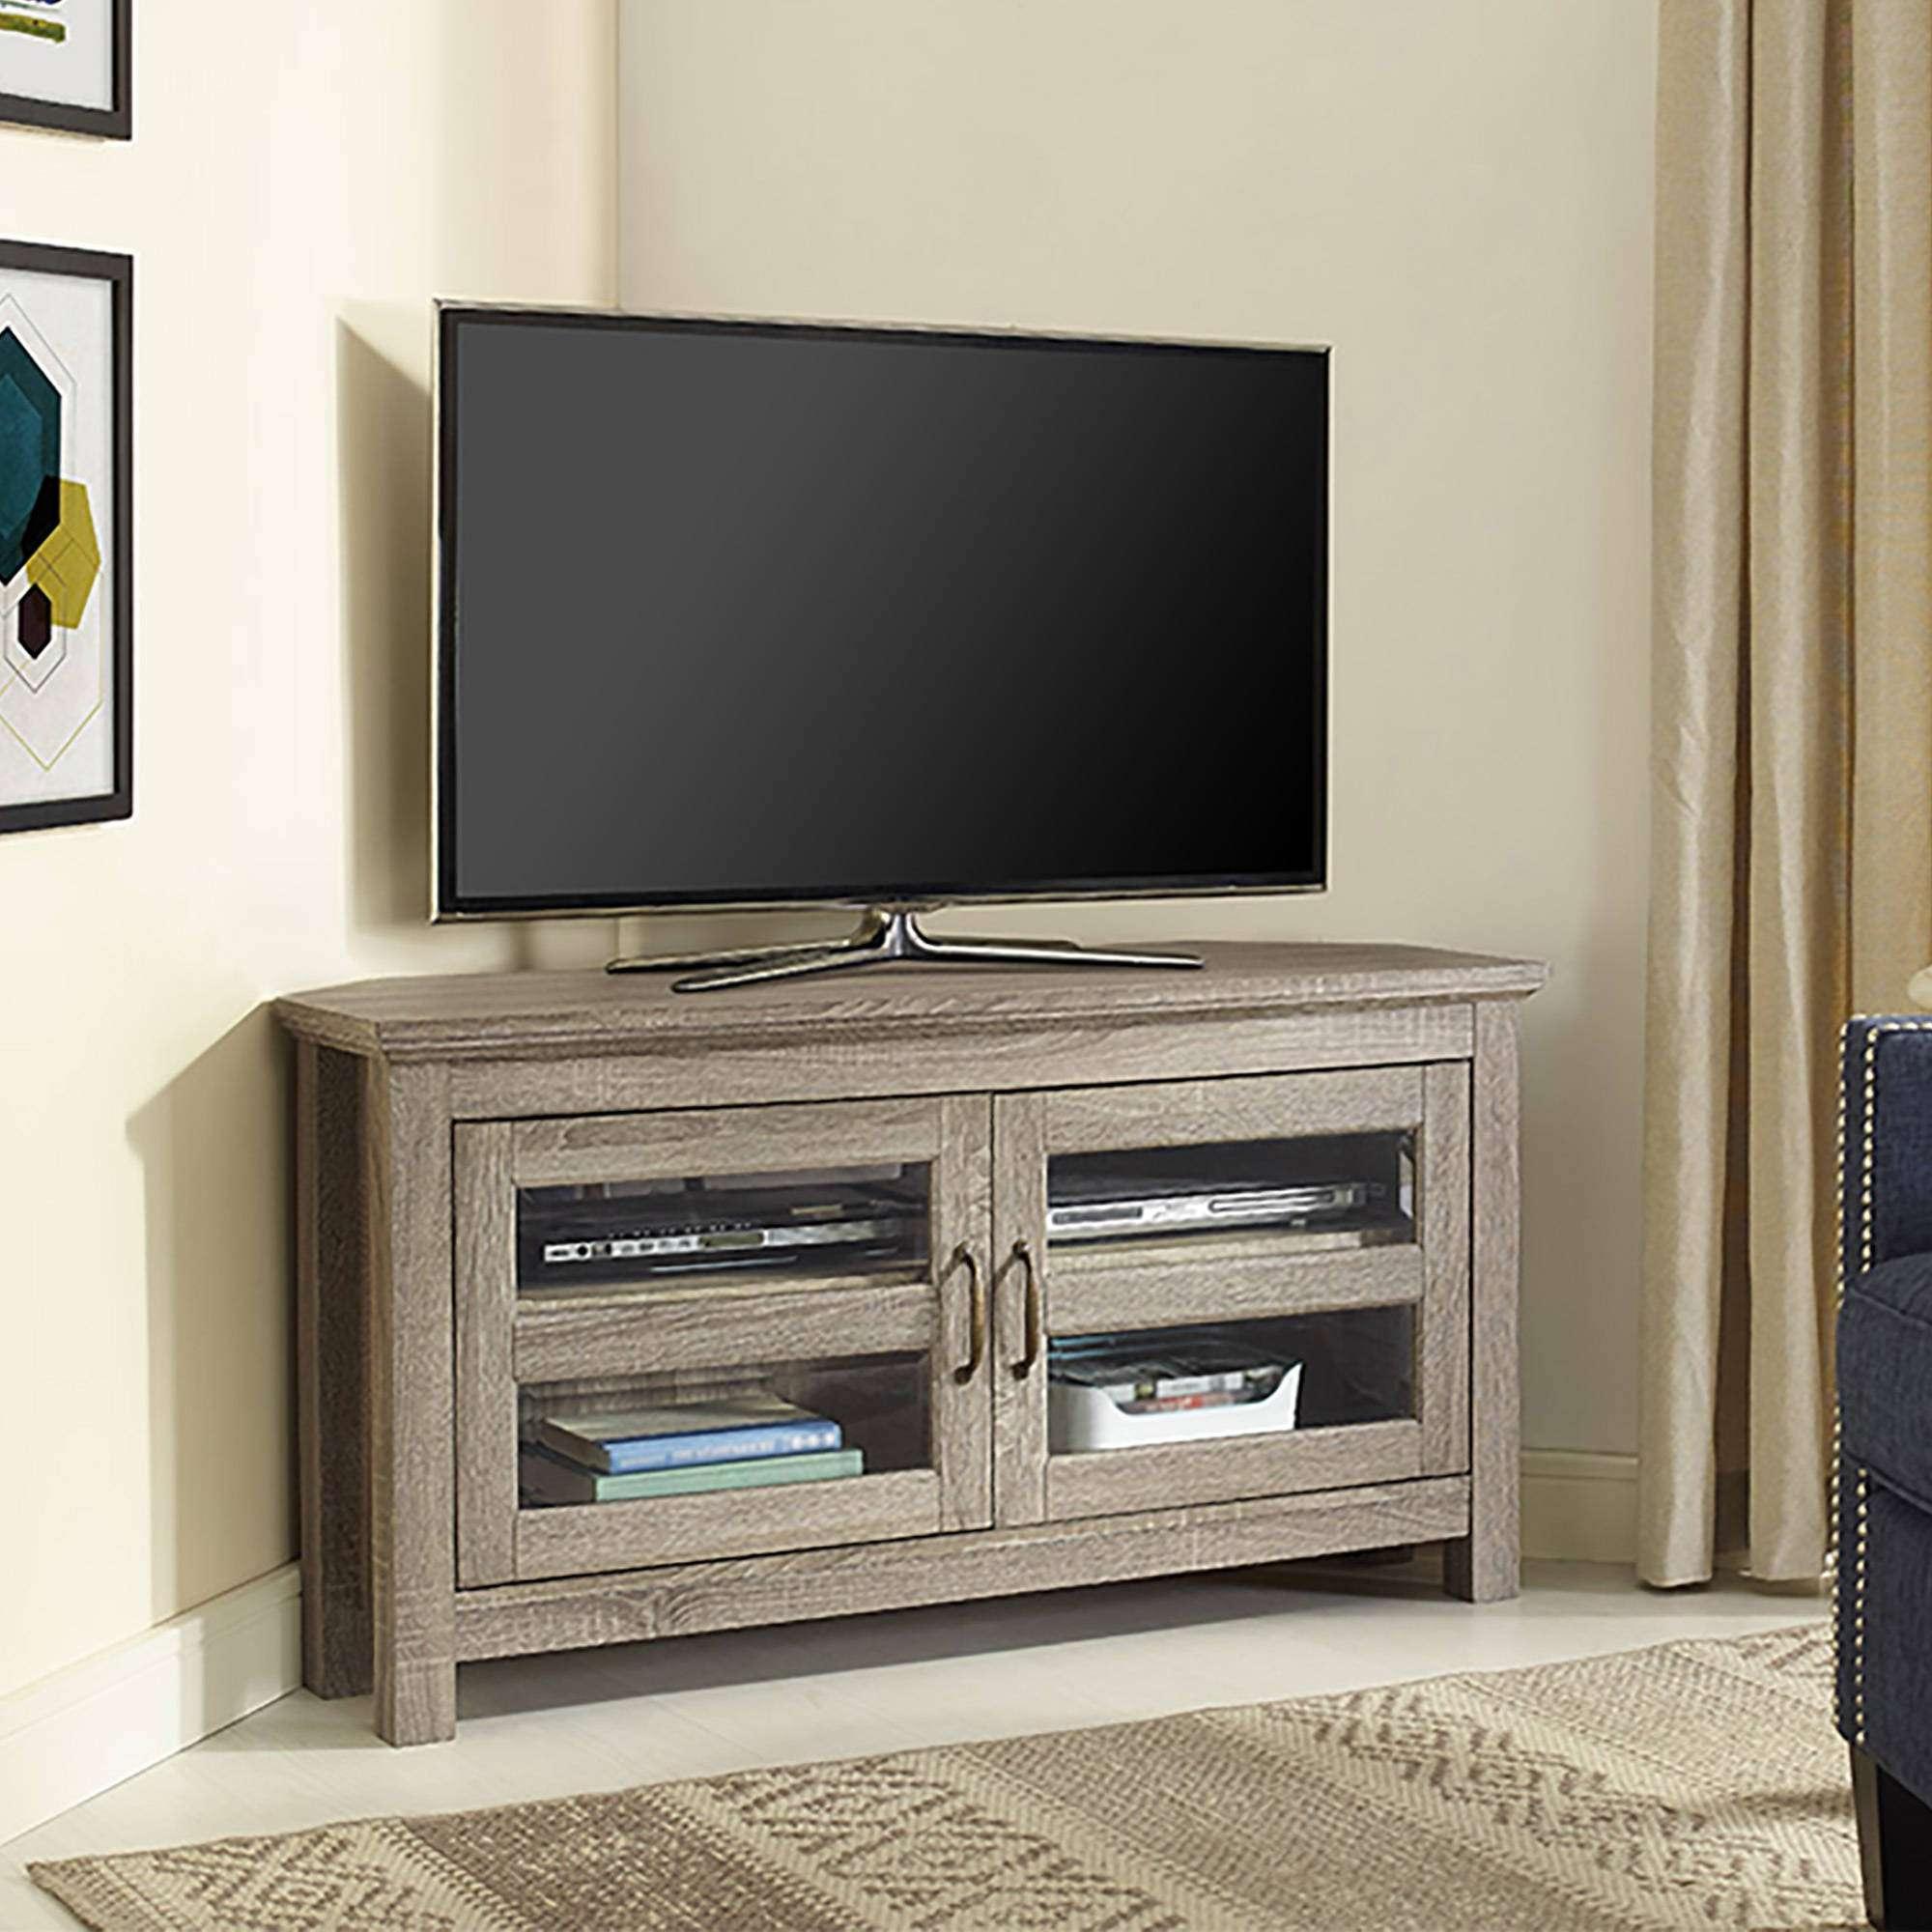 Tv : Gratifying Corner Tv Stands 40 Inch Flat Screen Top 40 Inch With 40 Inch Corner Tv Stands (View 3 of 15)